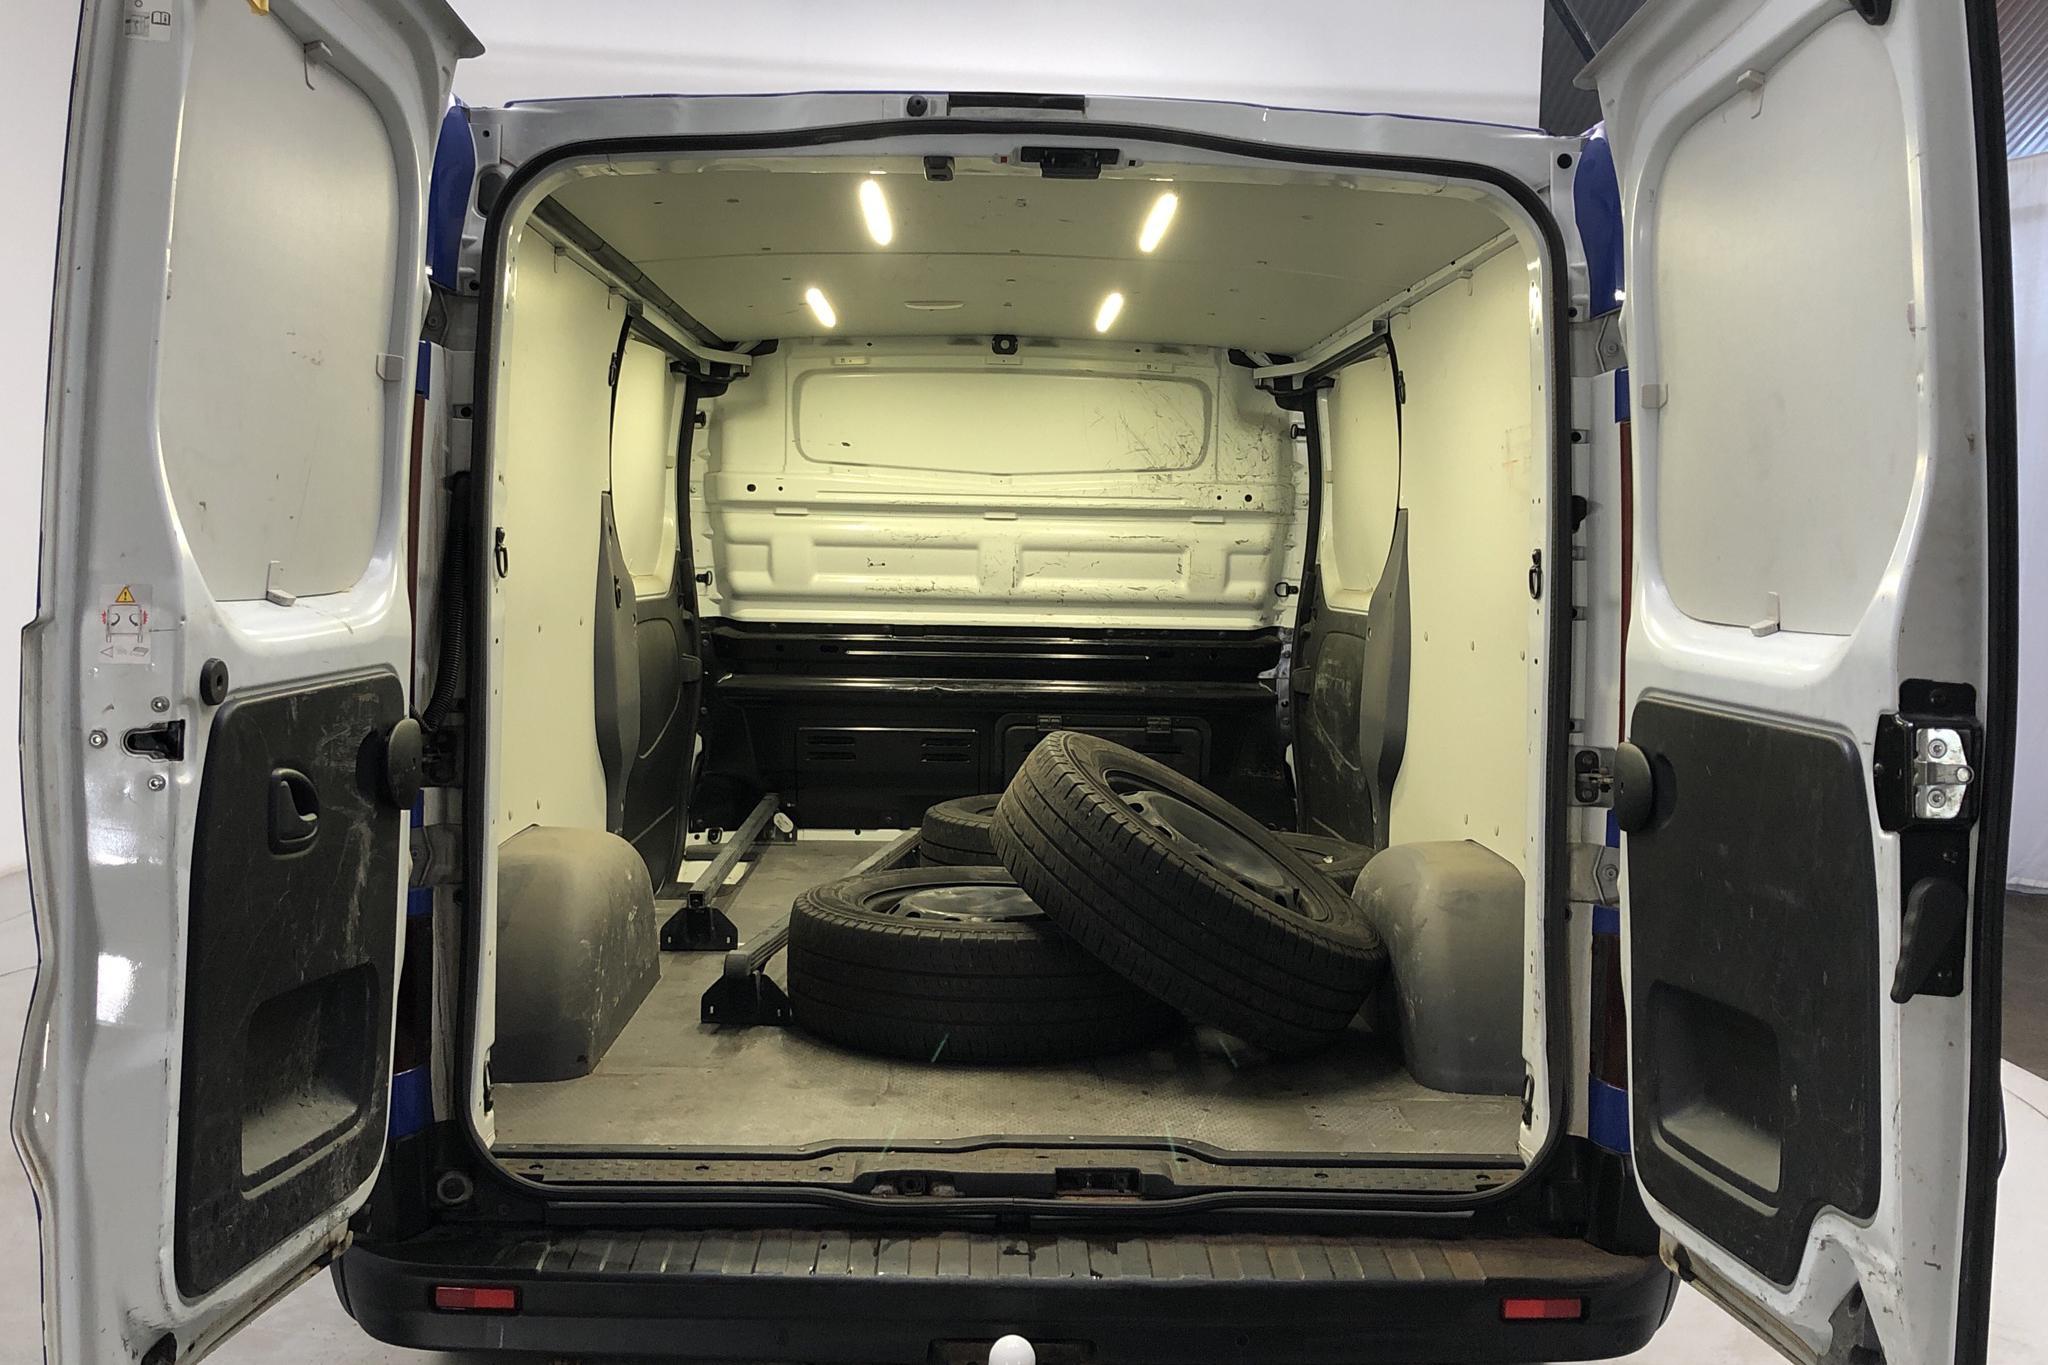 Renault Trafic 1.6 dCi Skåp (140hk) - 123 820 km - Manual - white - 2015